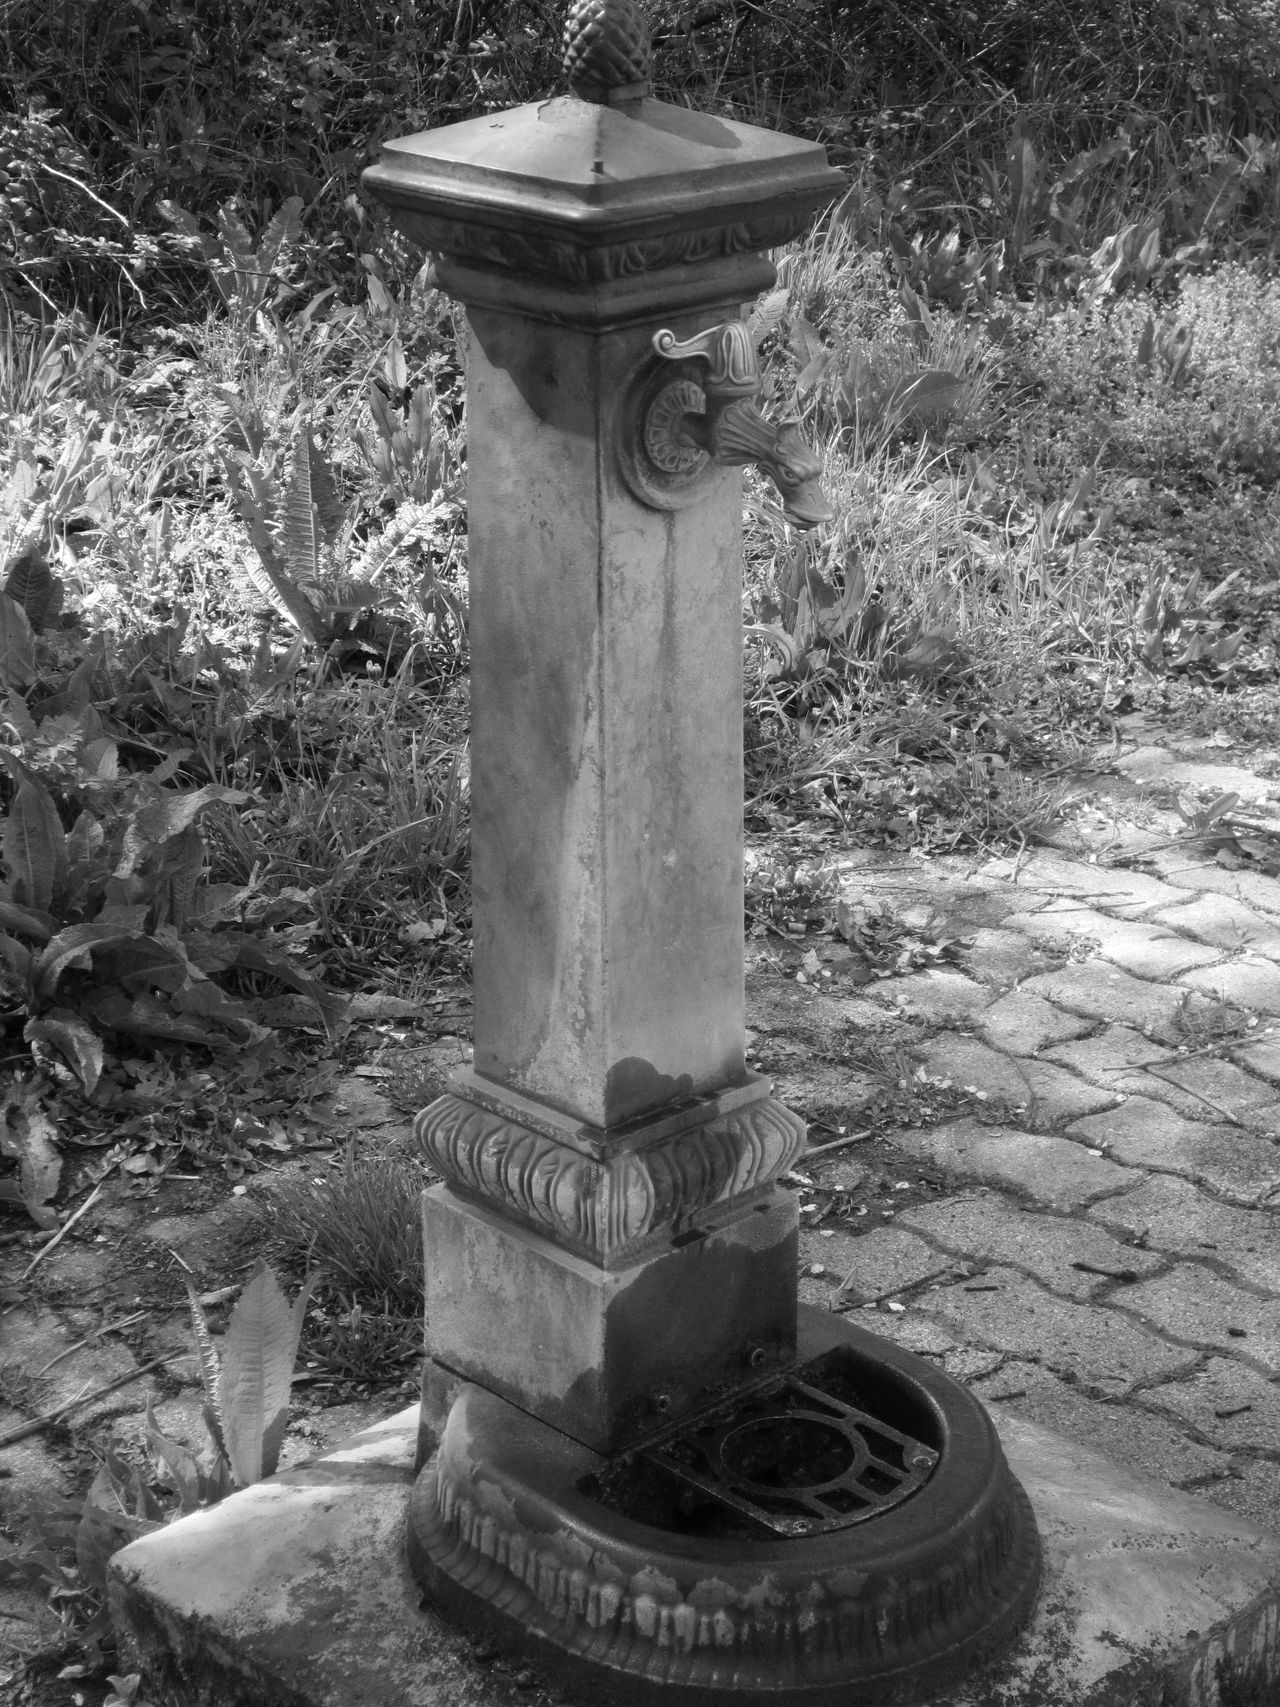 #Black&White #potenza #potenzainferiore #basilicata #blackandwhite #fotobianconero #bianco&nero #OldPicture #vialedelbasento